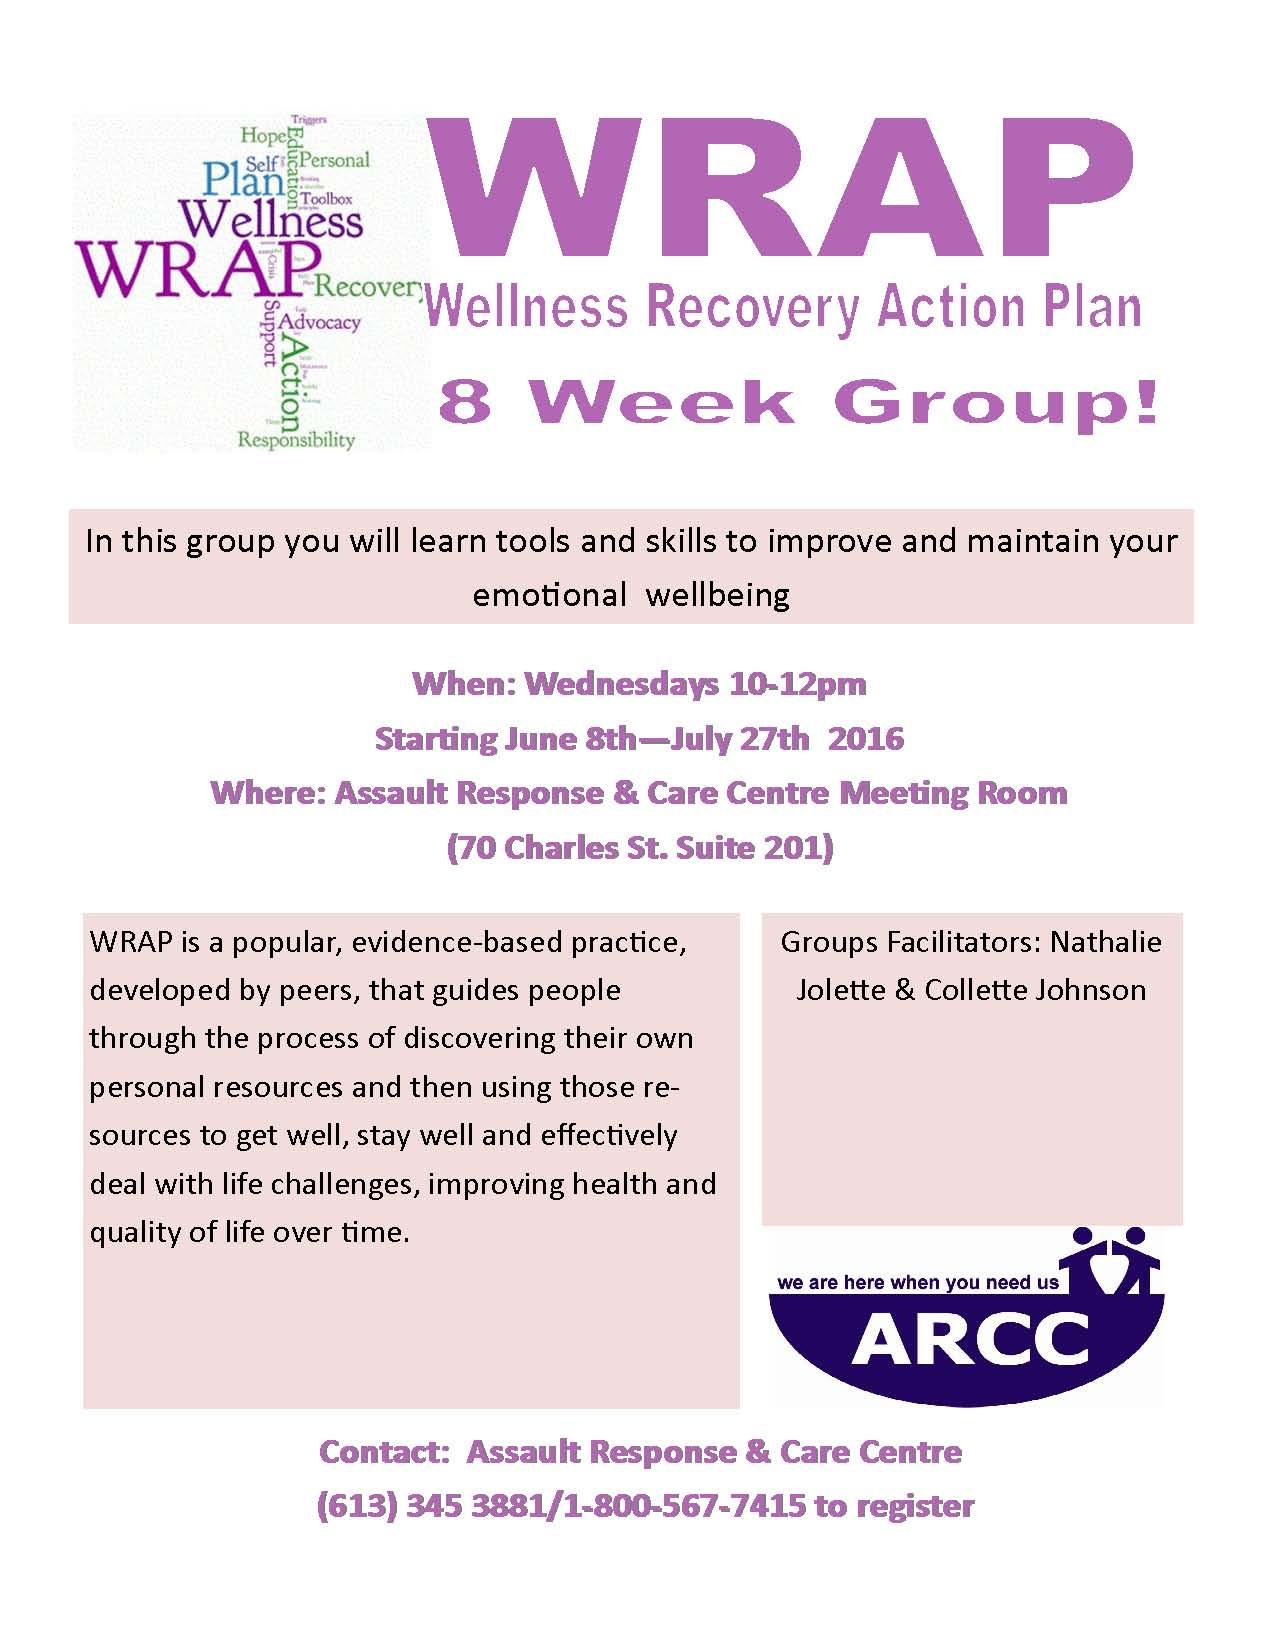 Calendar on Wellness Recovery Action Plan